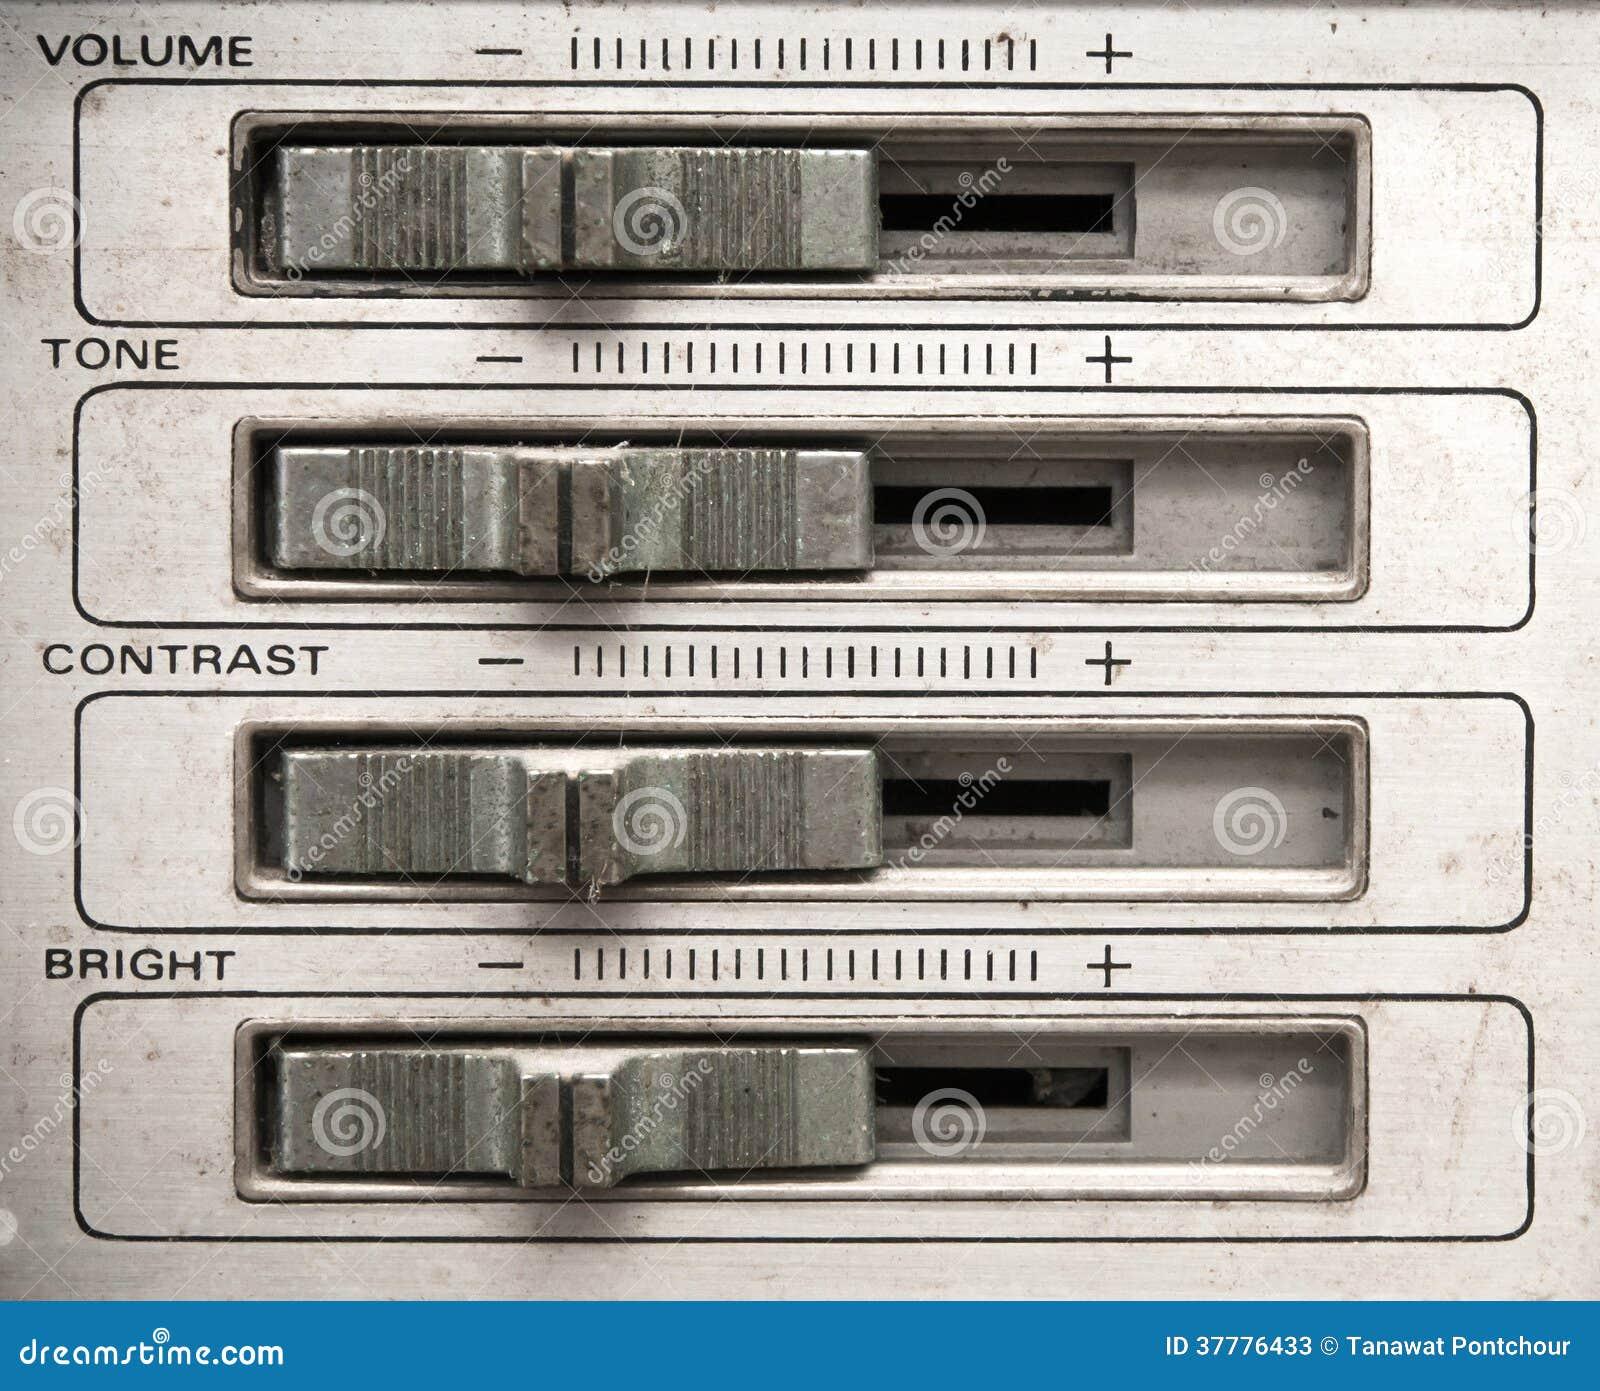 Volume Sound Control Panel : Analog tv control panel stock photos image